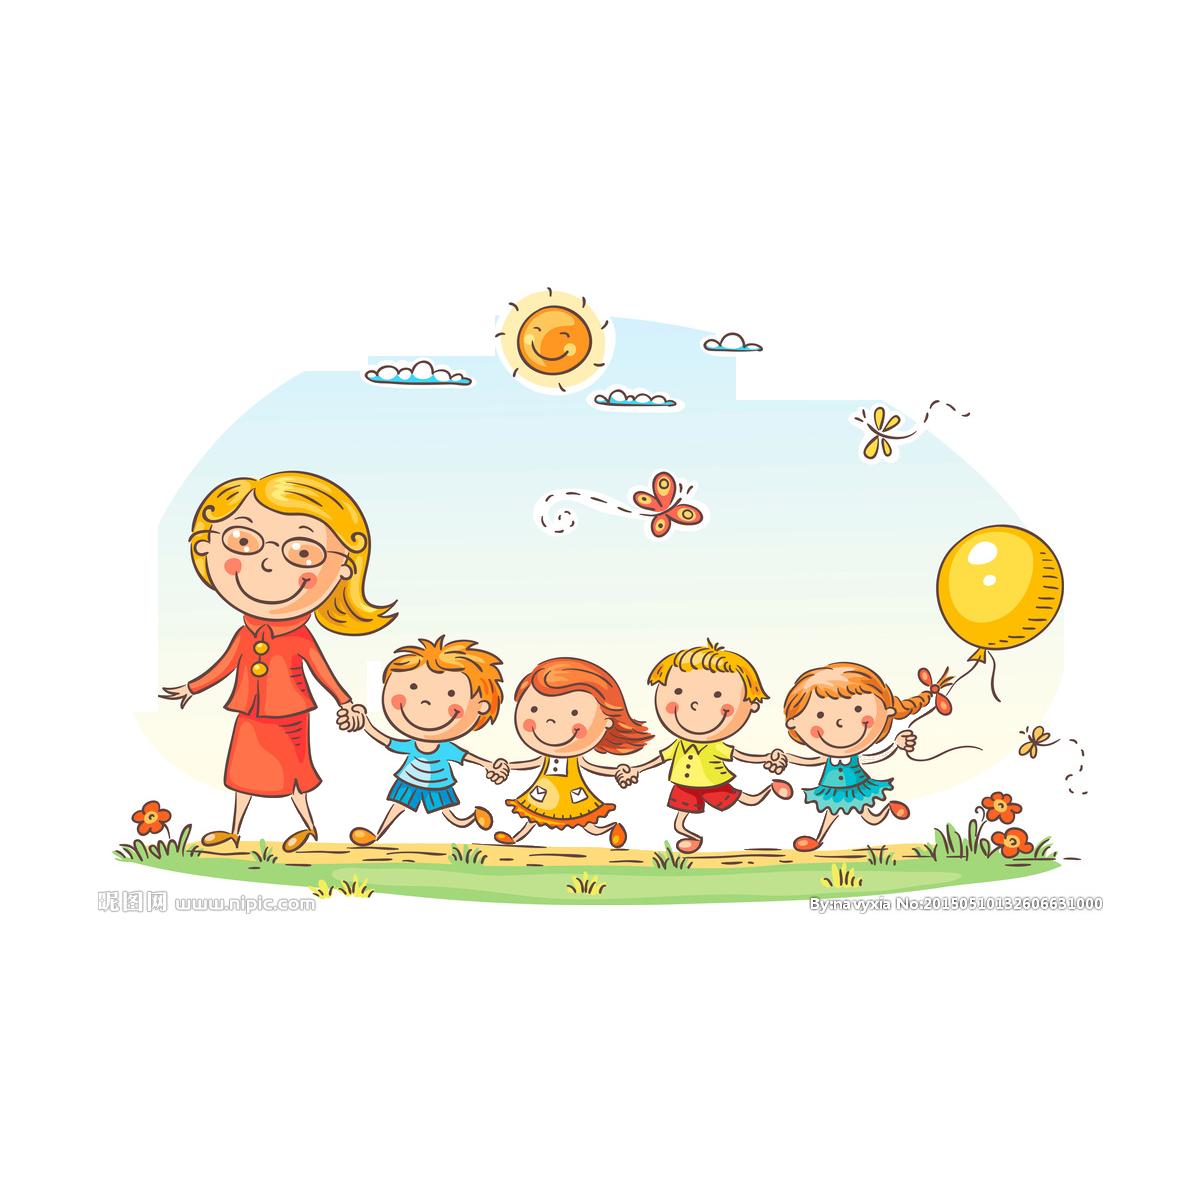 Teacher images gallery for. Free clipart preschool teachers